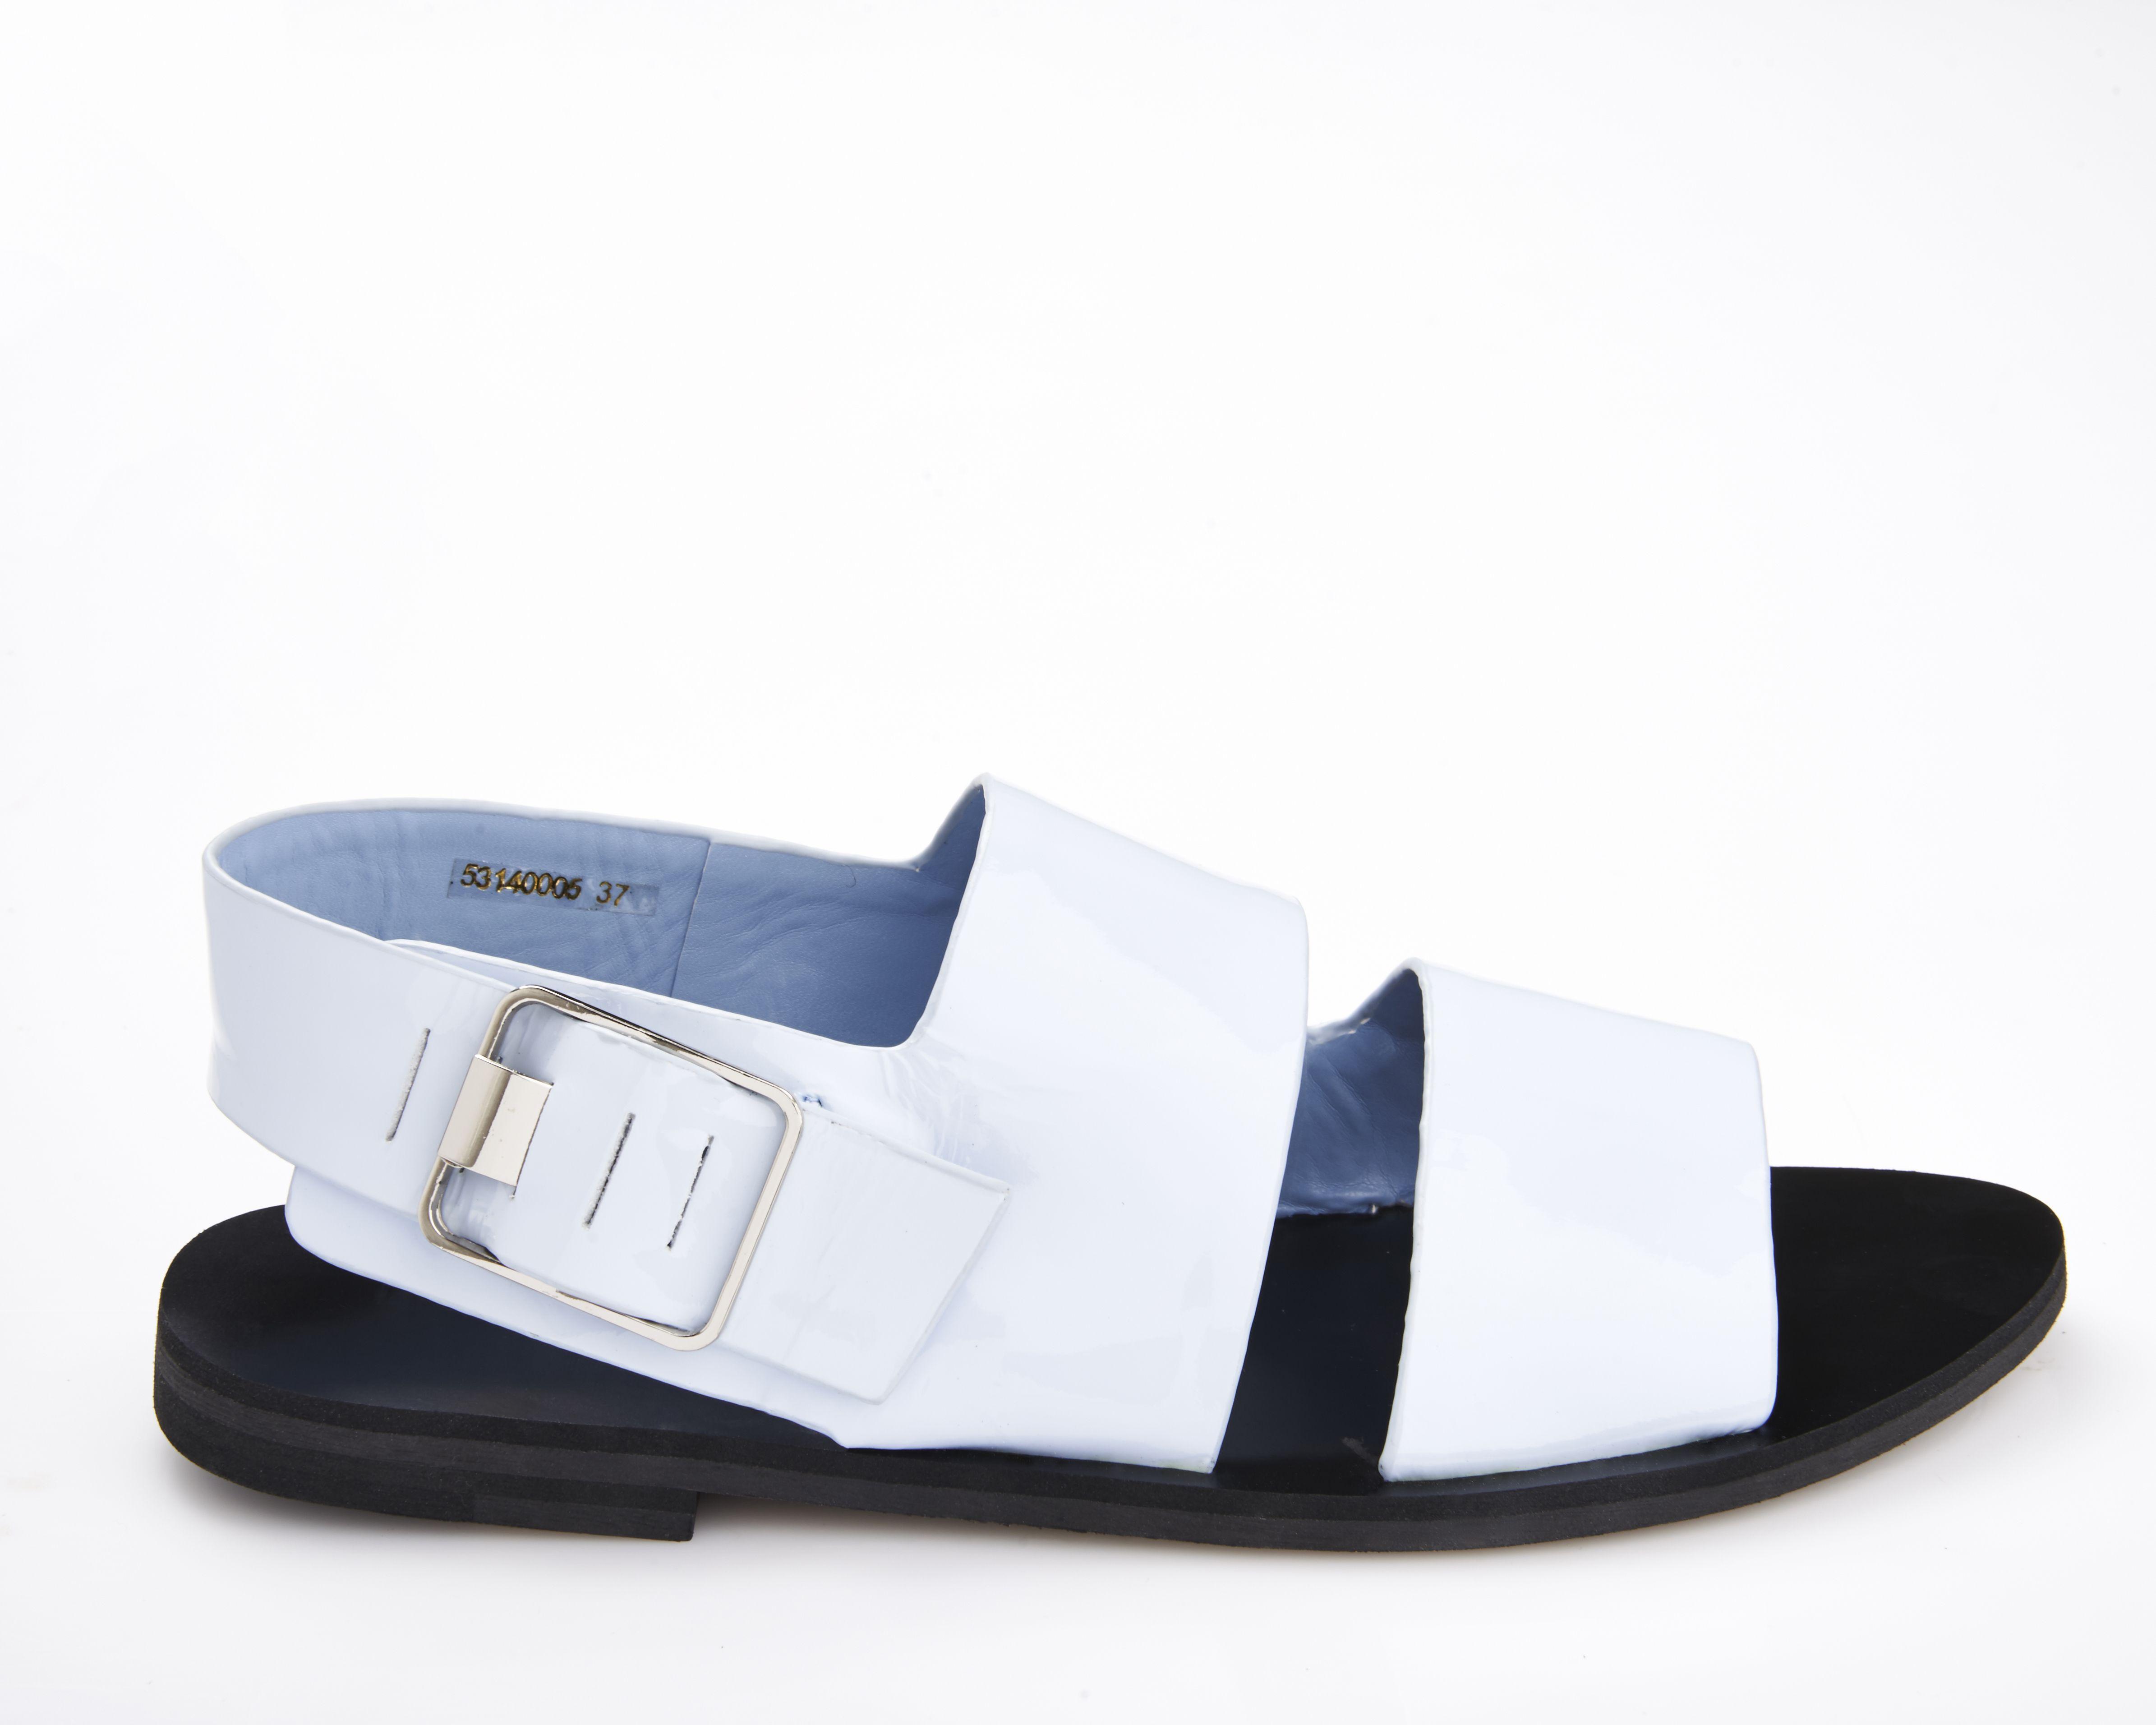 Mesh Insert Peep Toe Thin Heeled Sandals   Sandals heels